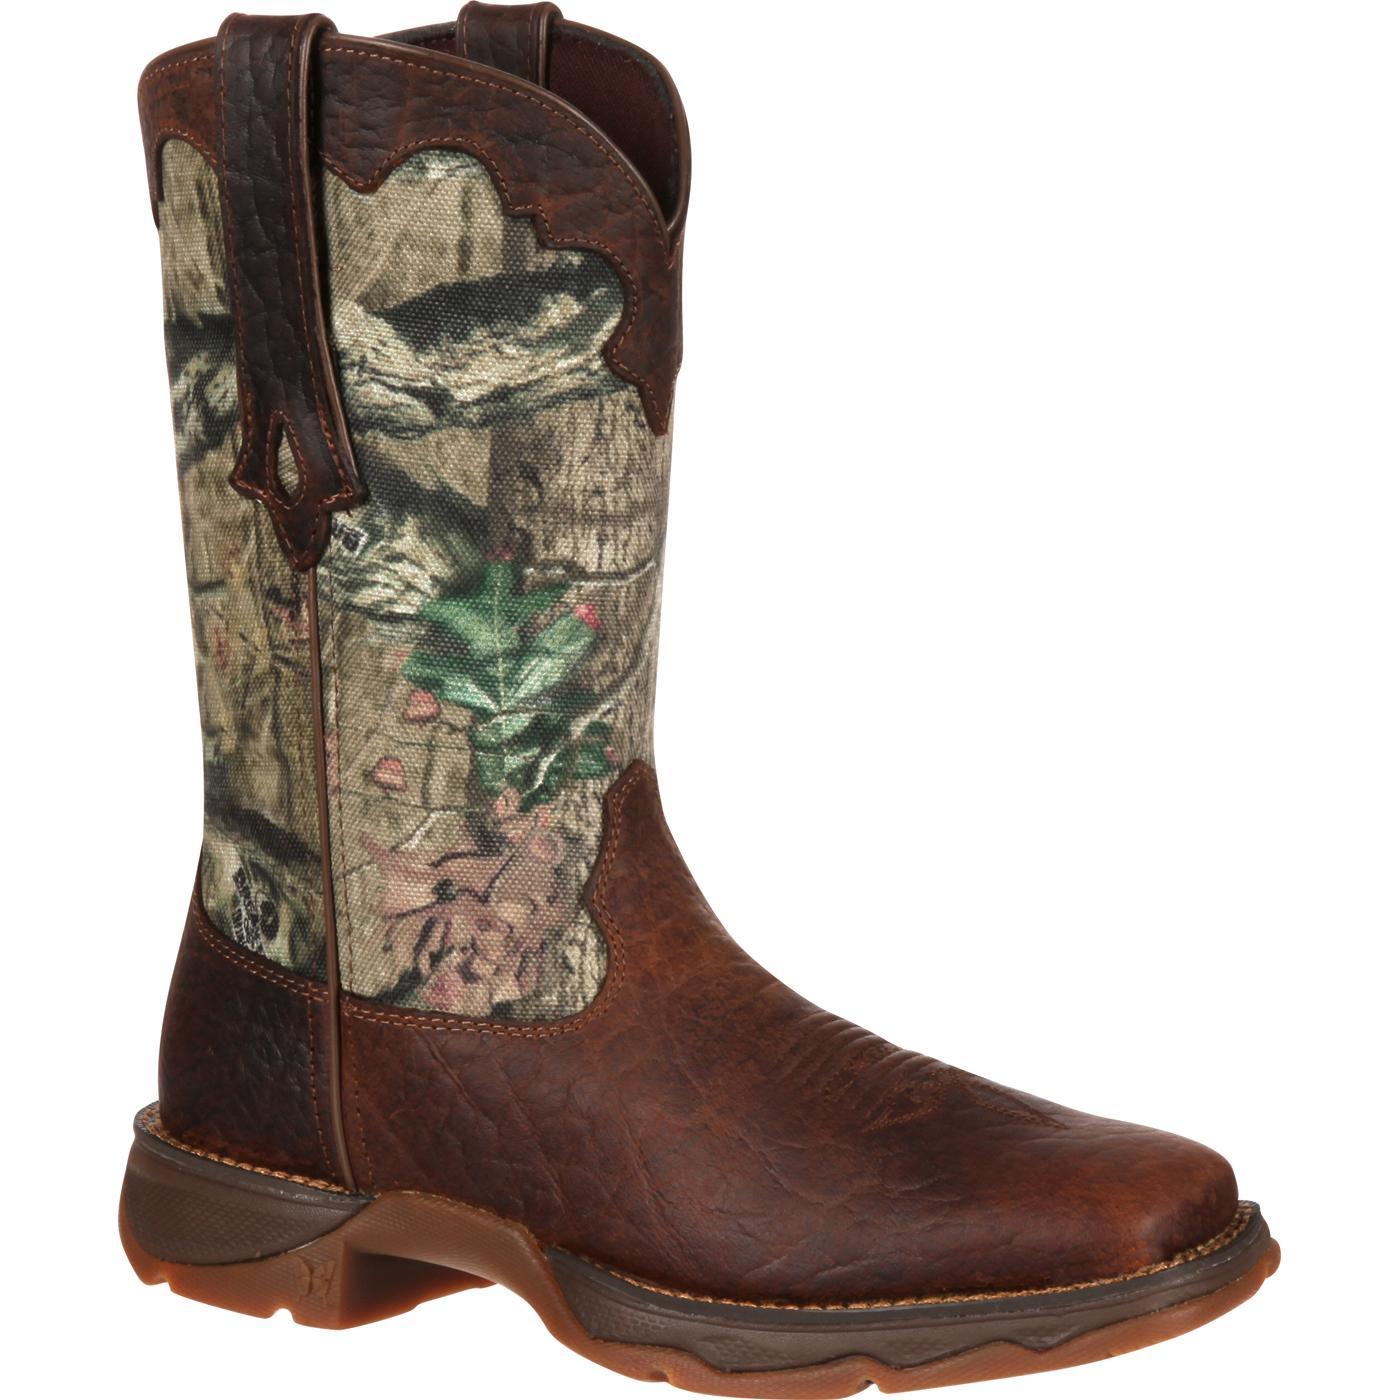 fcc5cdabc23 Lady Rebel by Durango Women's Camo Cutie Western Boot